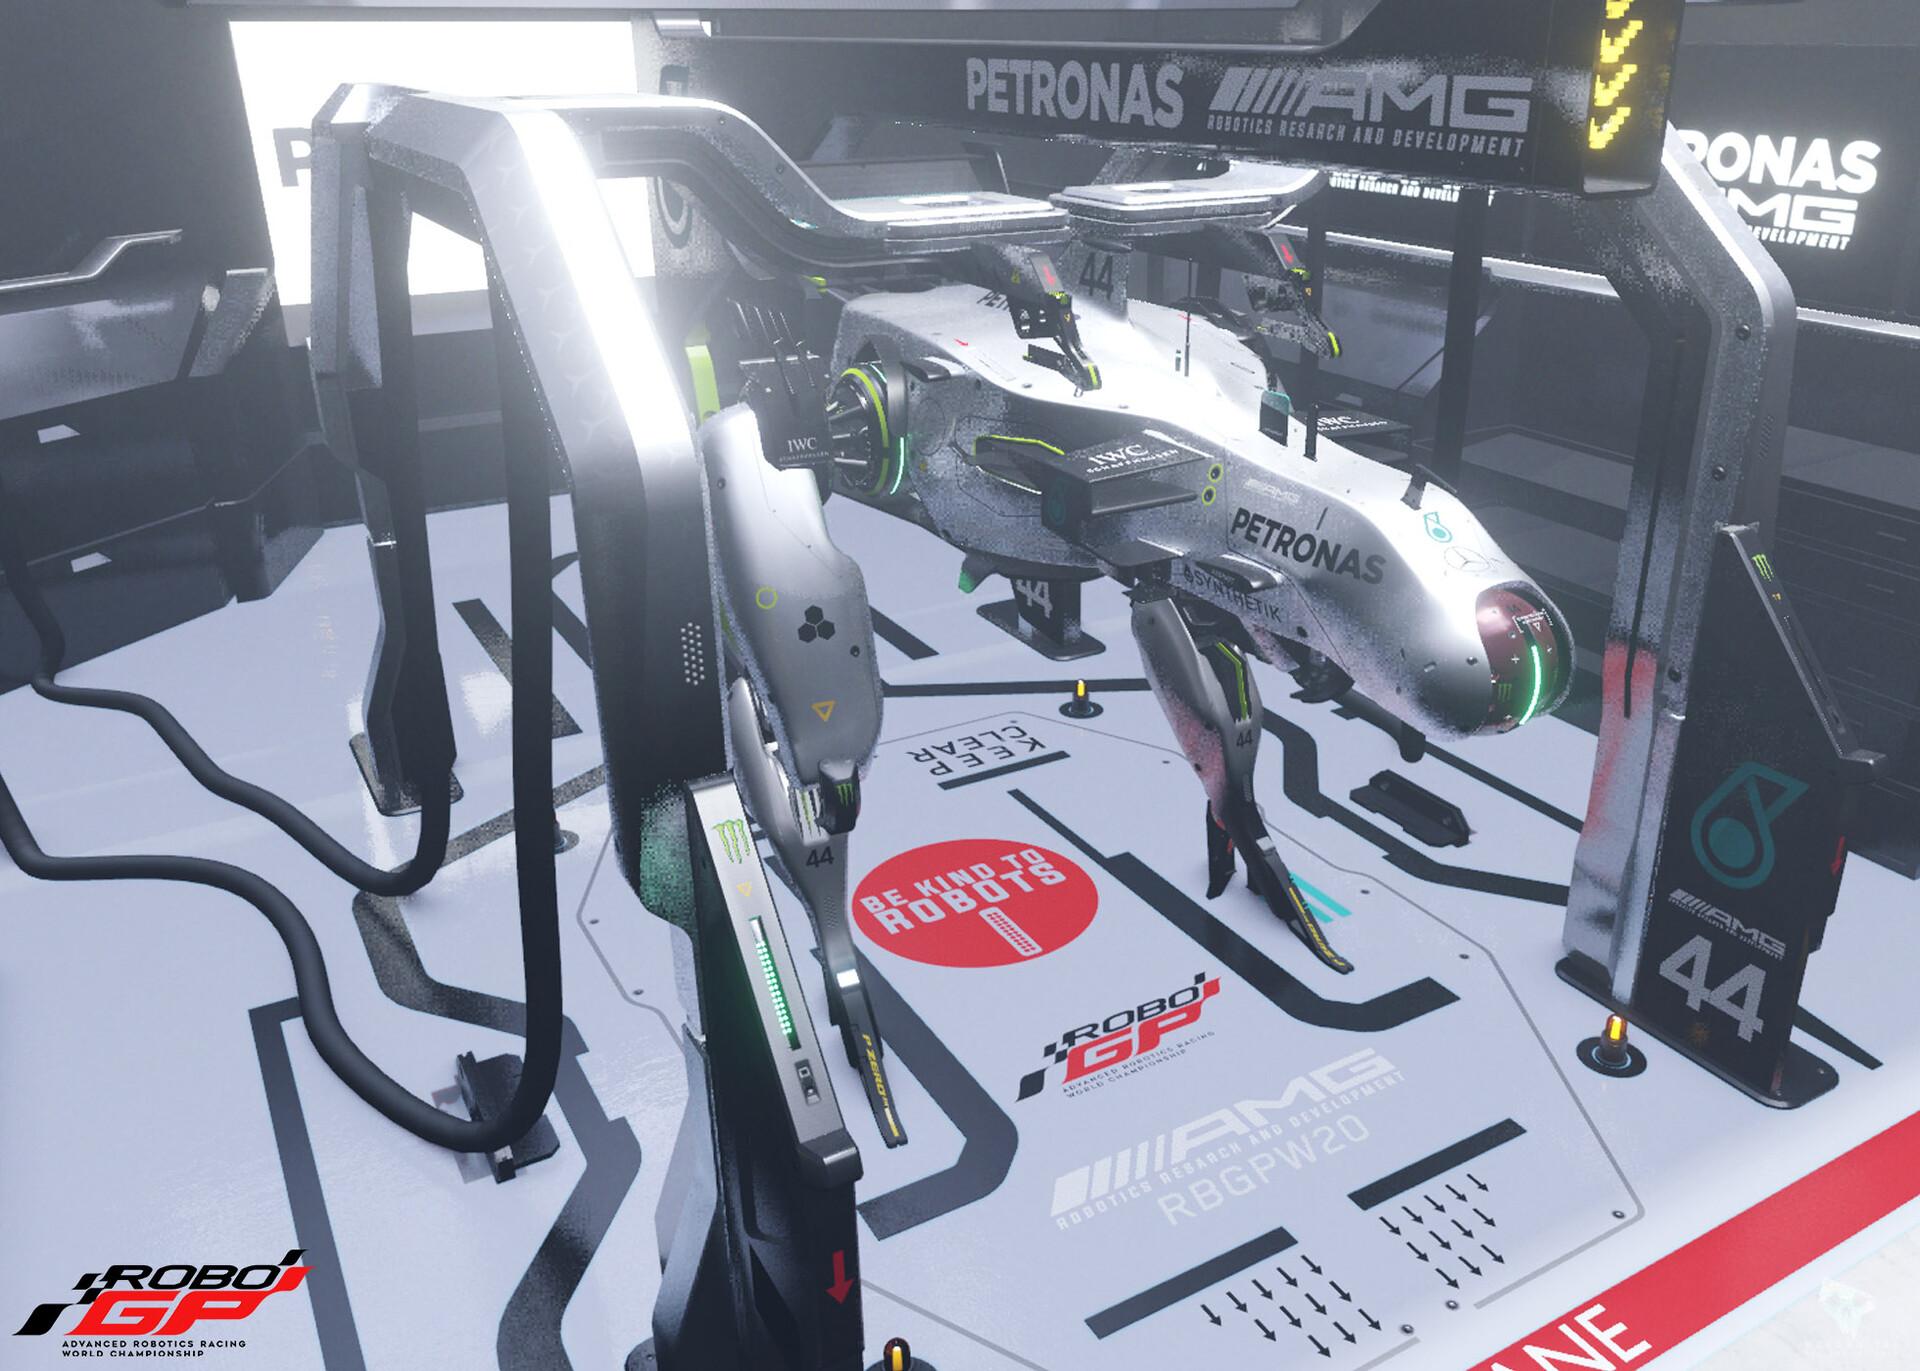 blender viewport - shiny garage